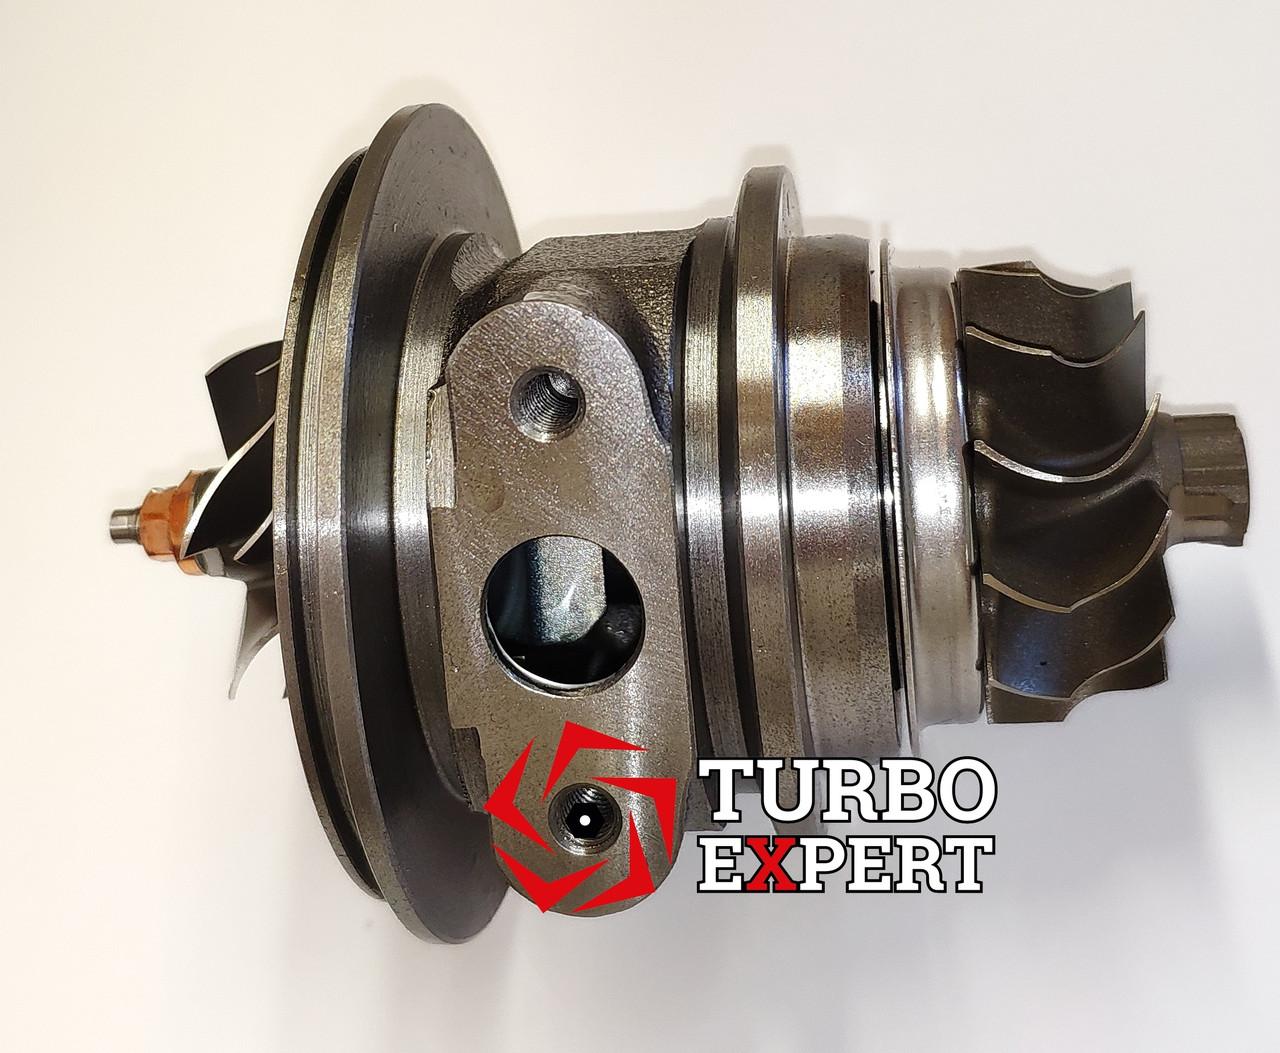 Картридж турбины 500335369, Iveco Daily, Fiat Ducato 2.8 TD, 8140.43S.4000 Euro3, 1998+, 994626070, 500372213